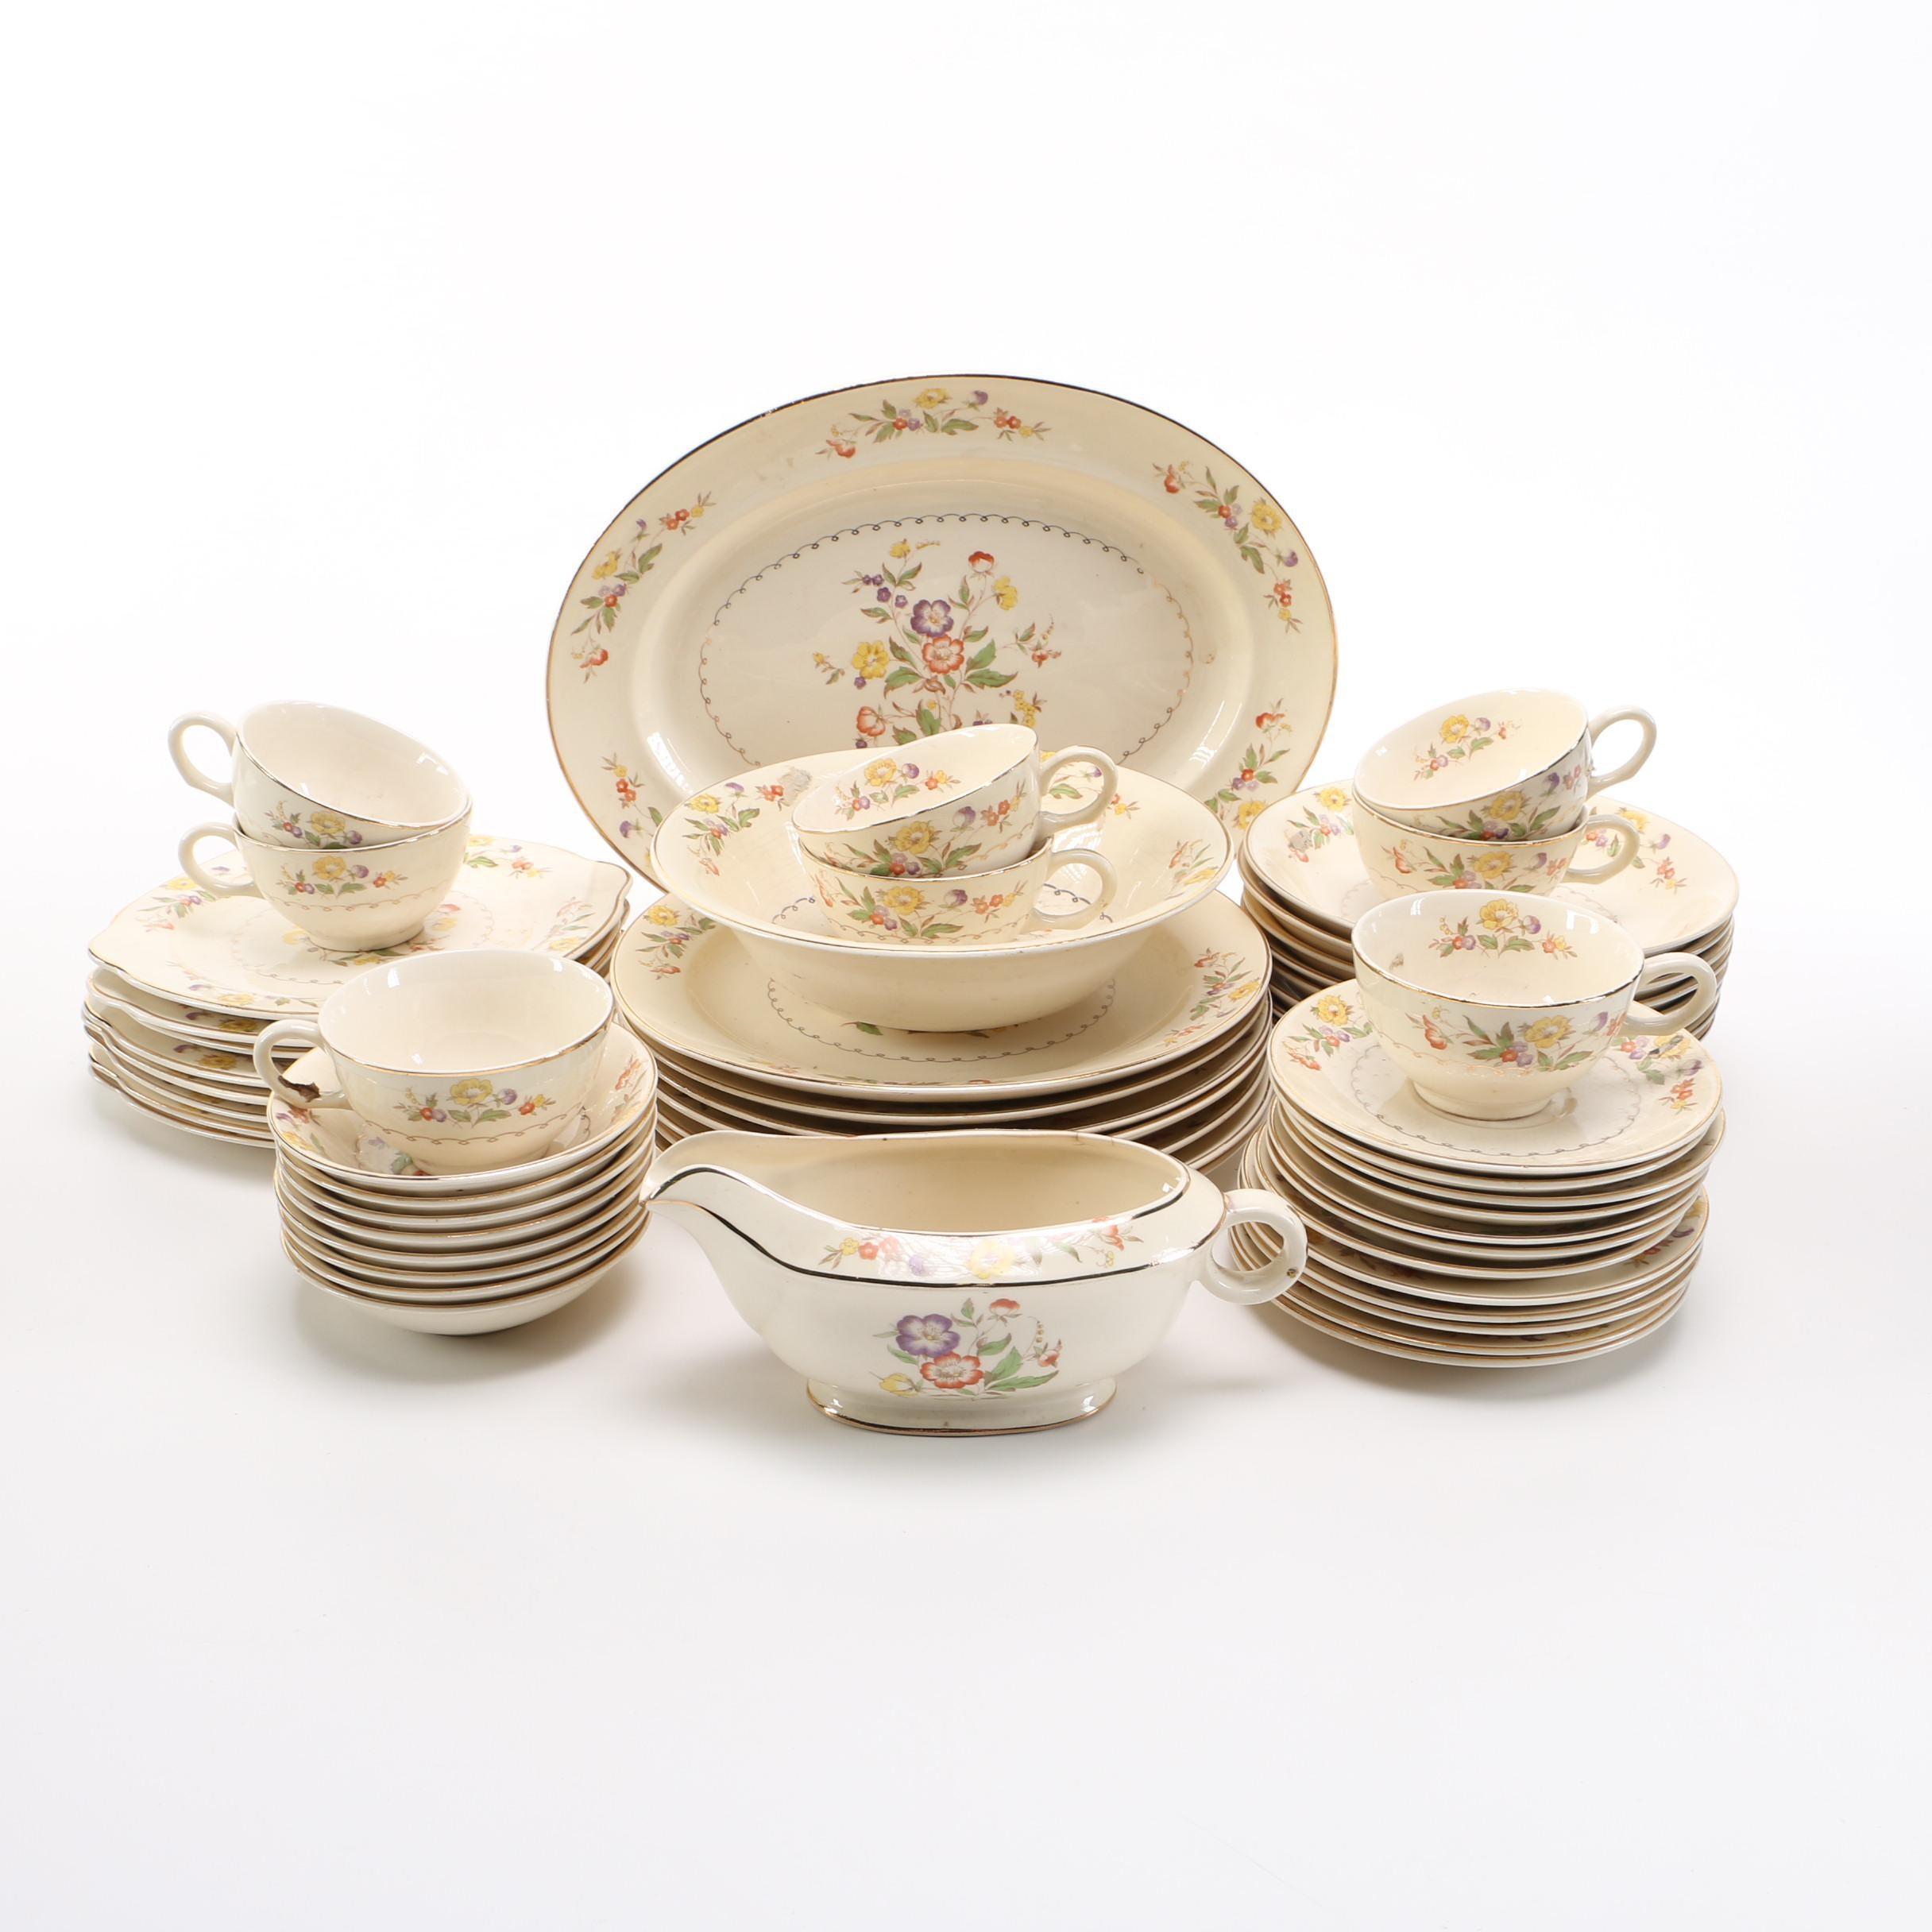 Set of Paden City Pottery Dinnerware ...  sc 1 st  EBTH.com & Set of Paden City Pottery Dinnerware : EBTH